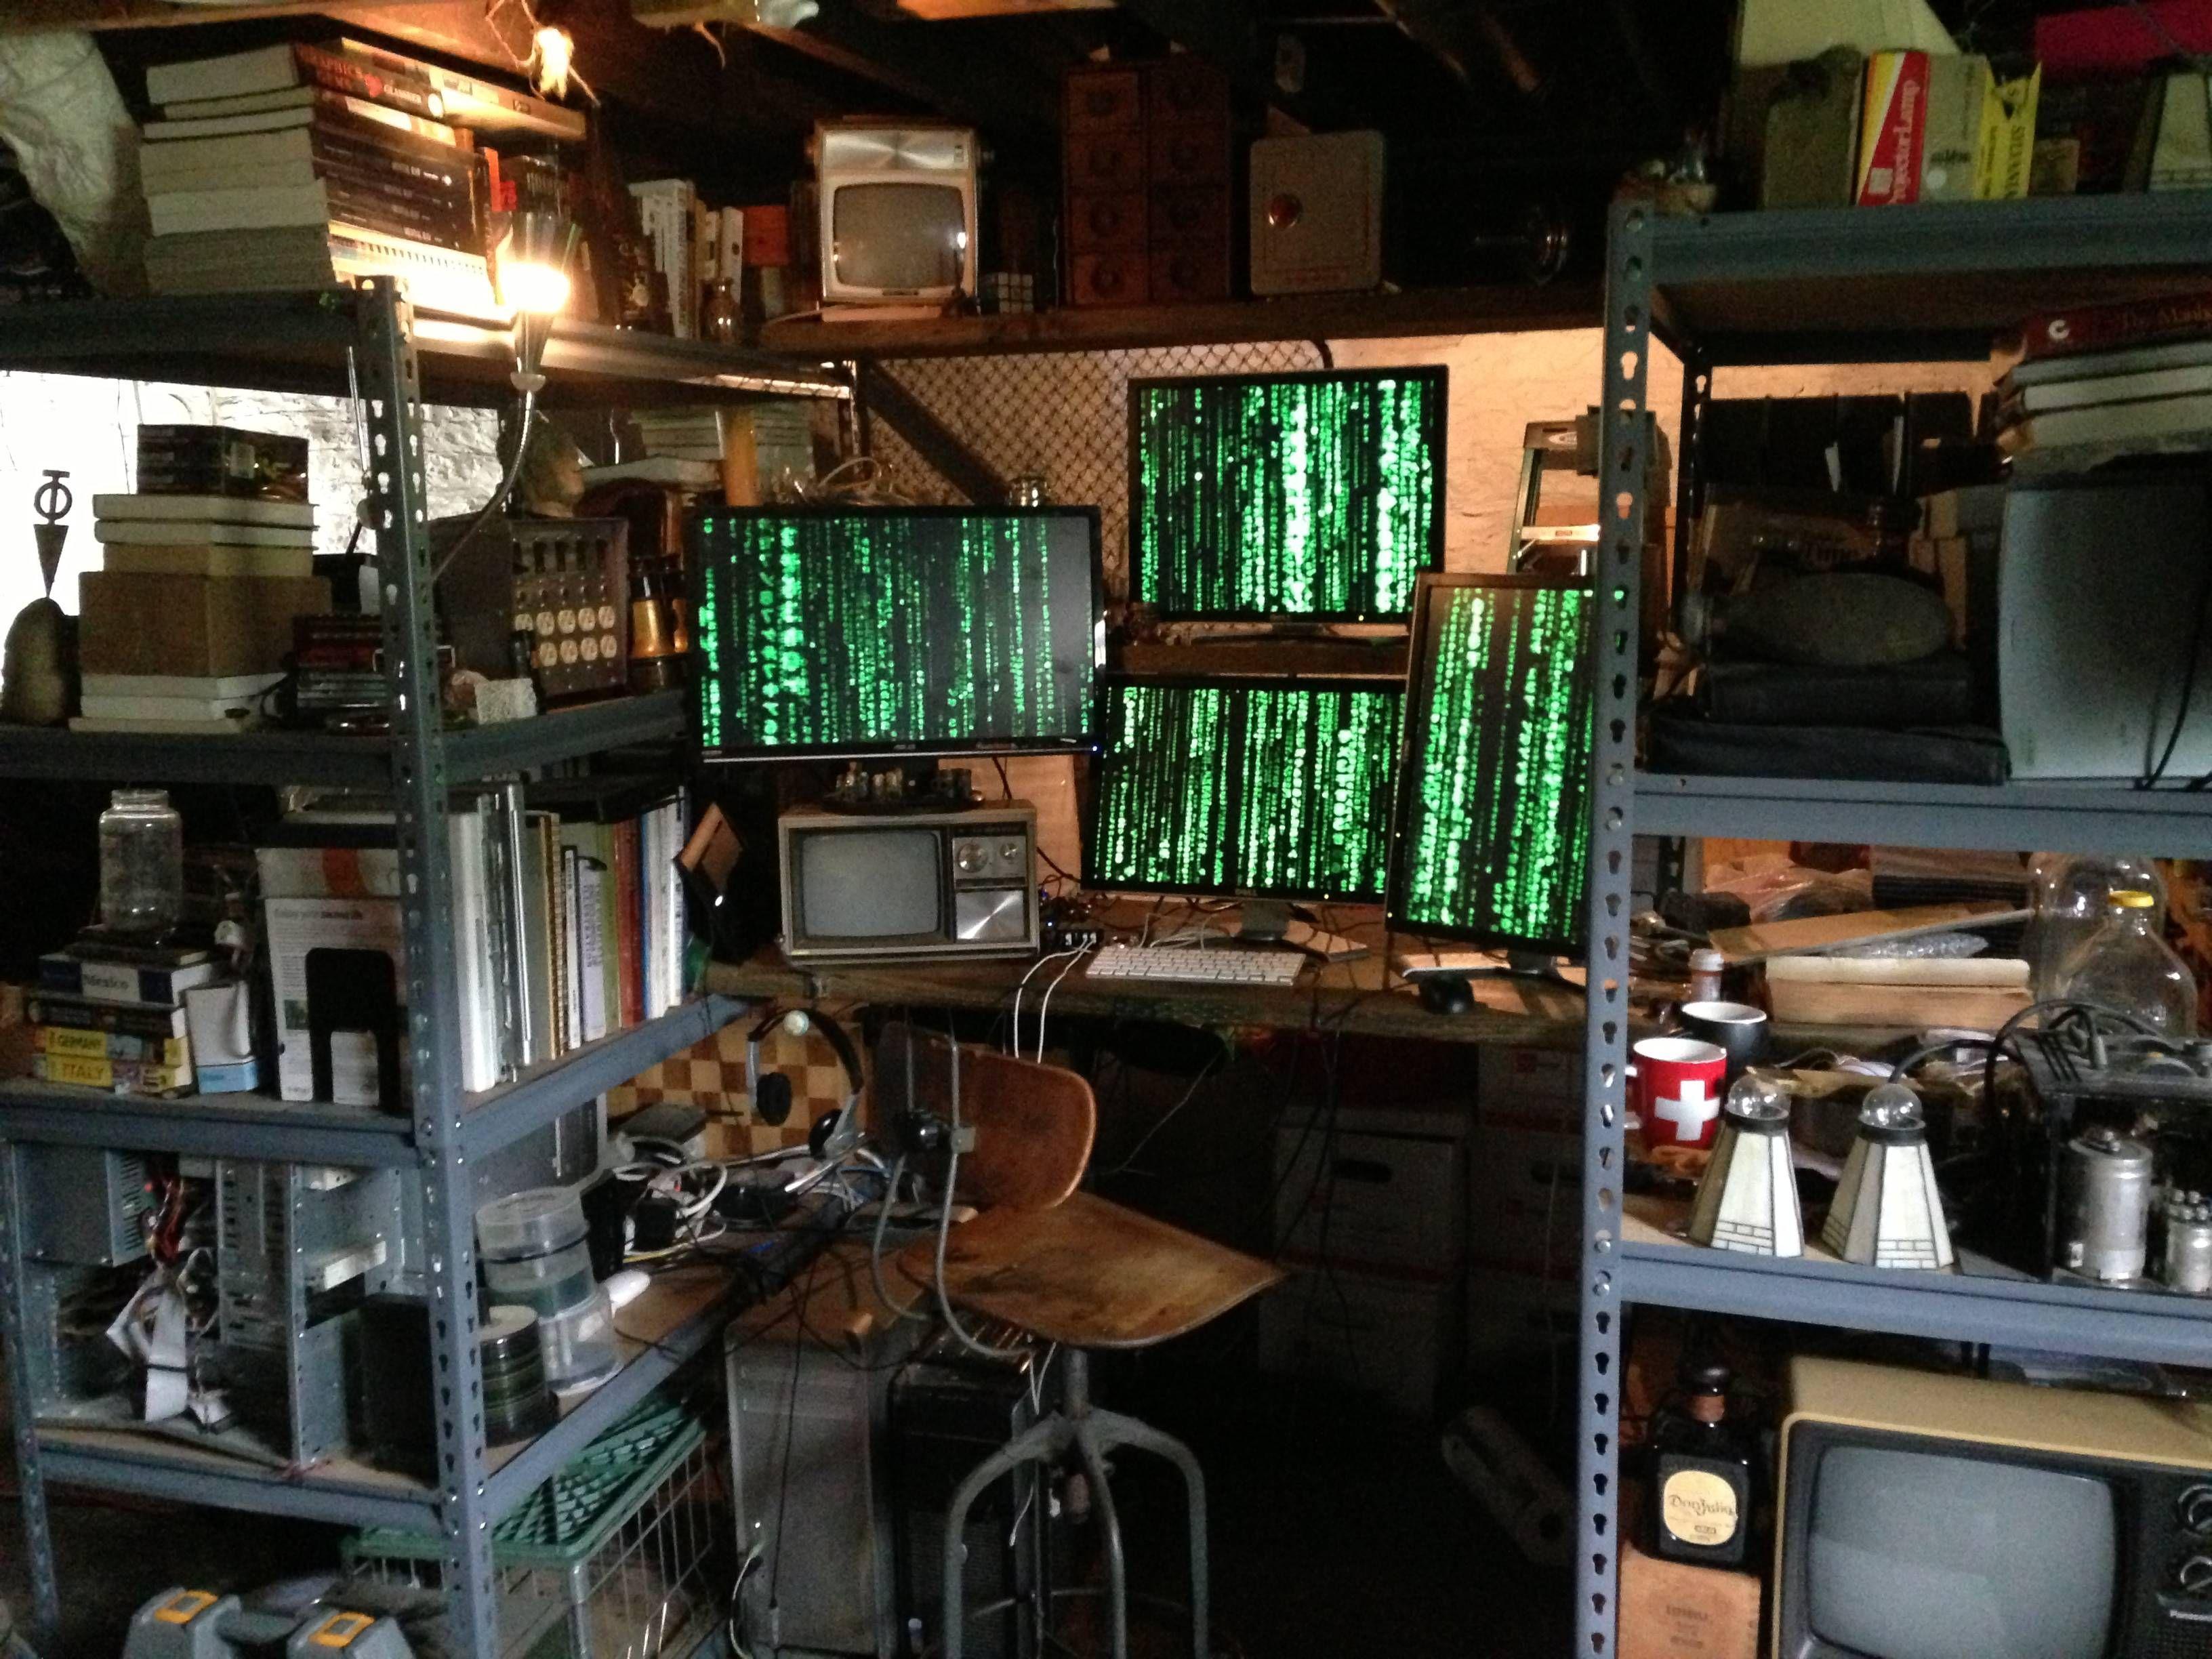 Cyberpunk chair cerca amb google commercial escac vfx for Cyberpunk interior design